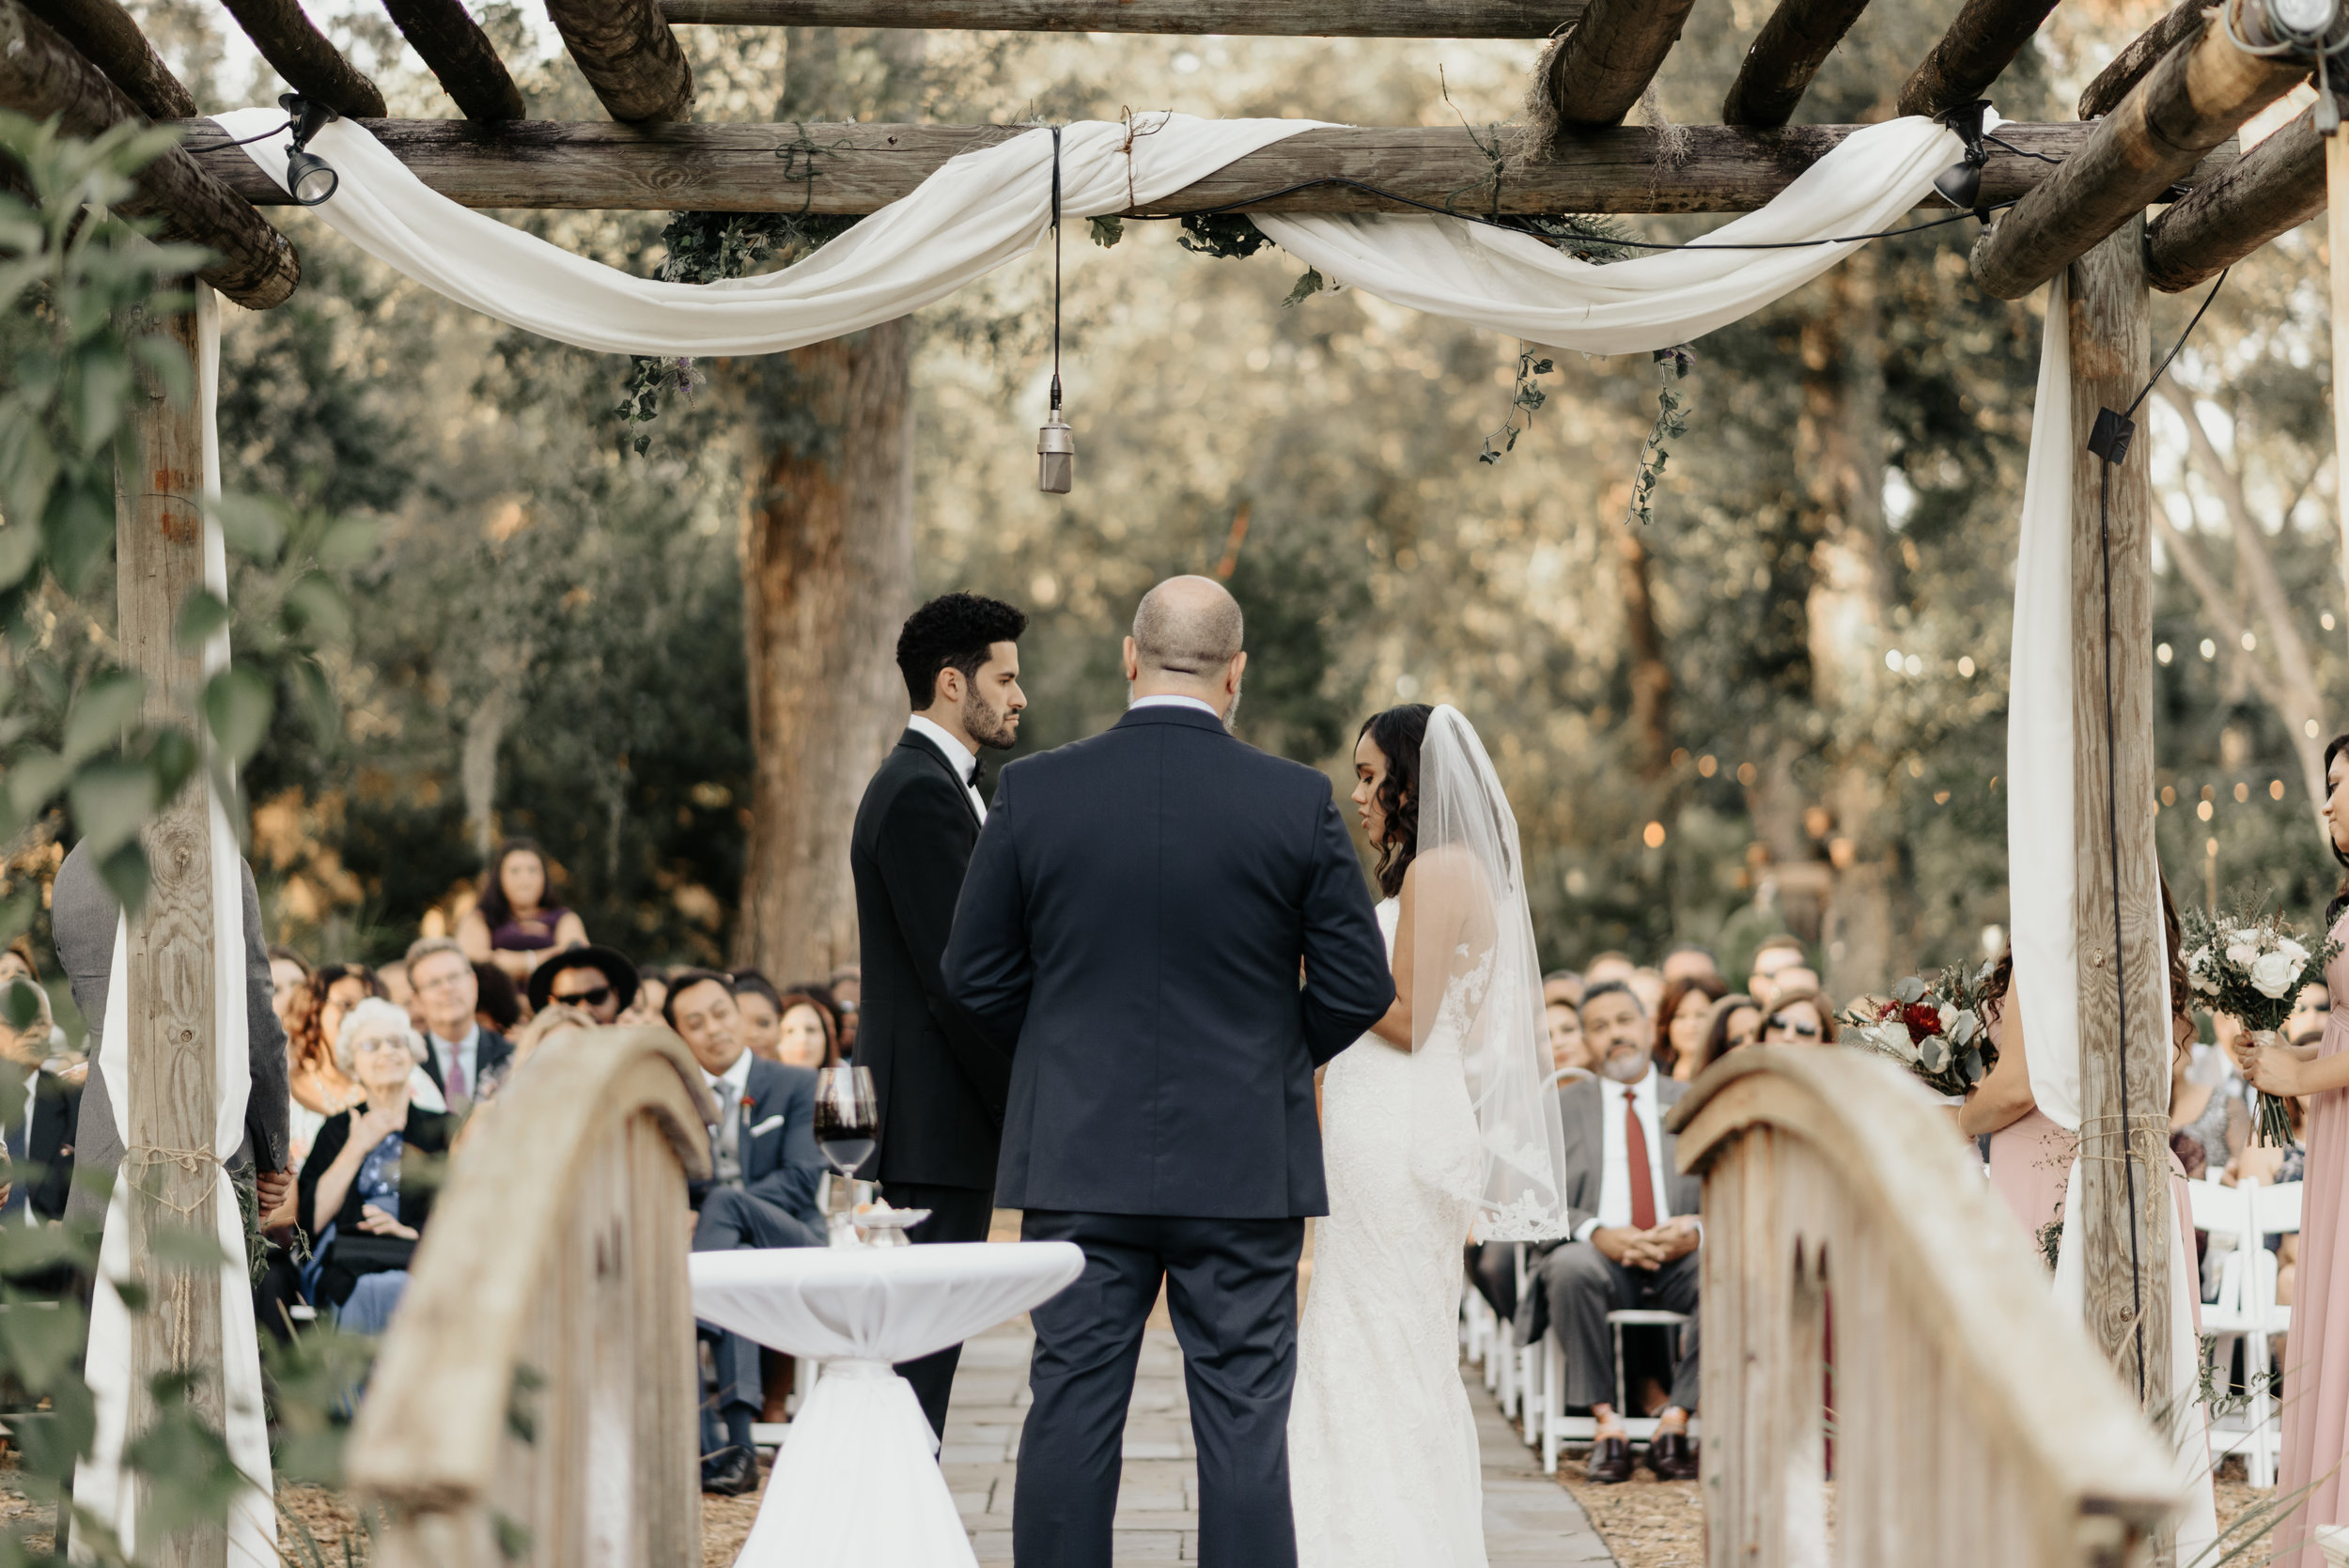 Kirstie-AJ-Wedding-9998.jpg